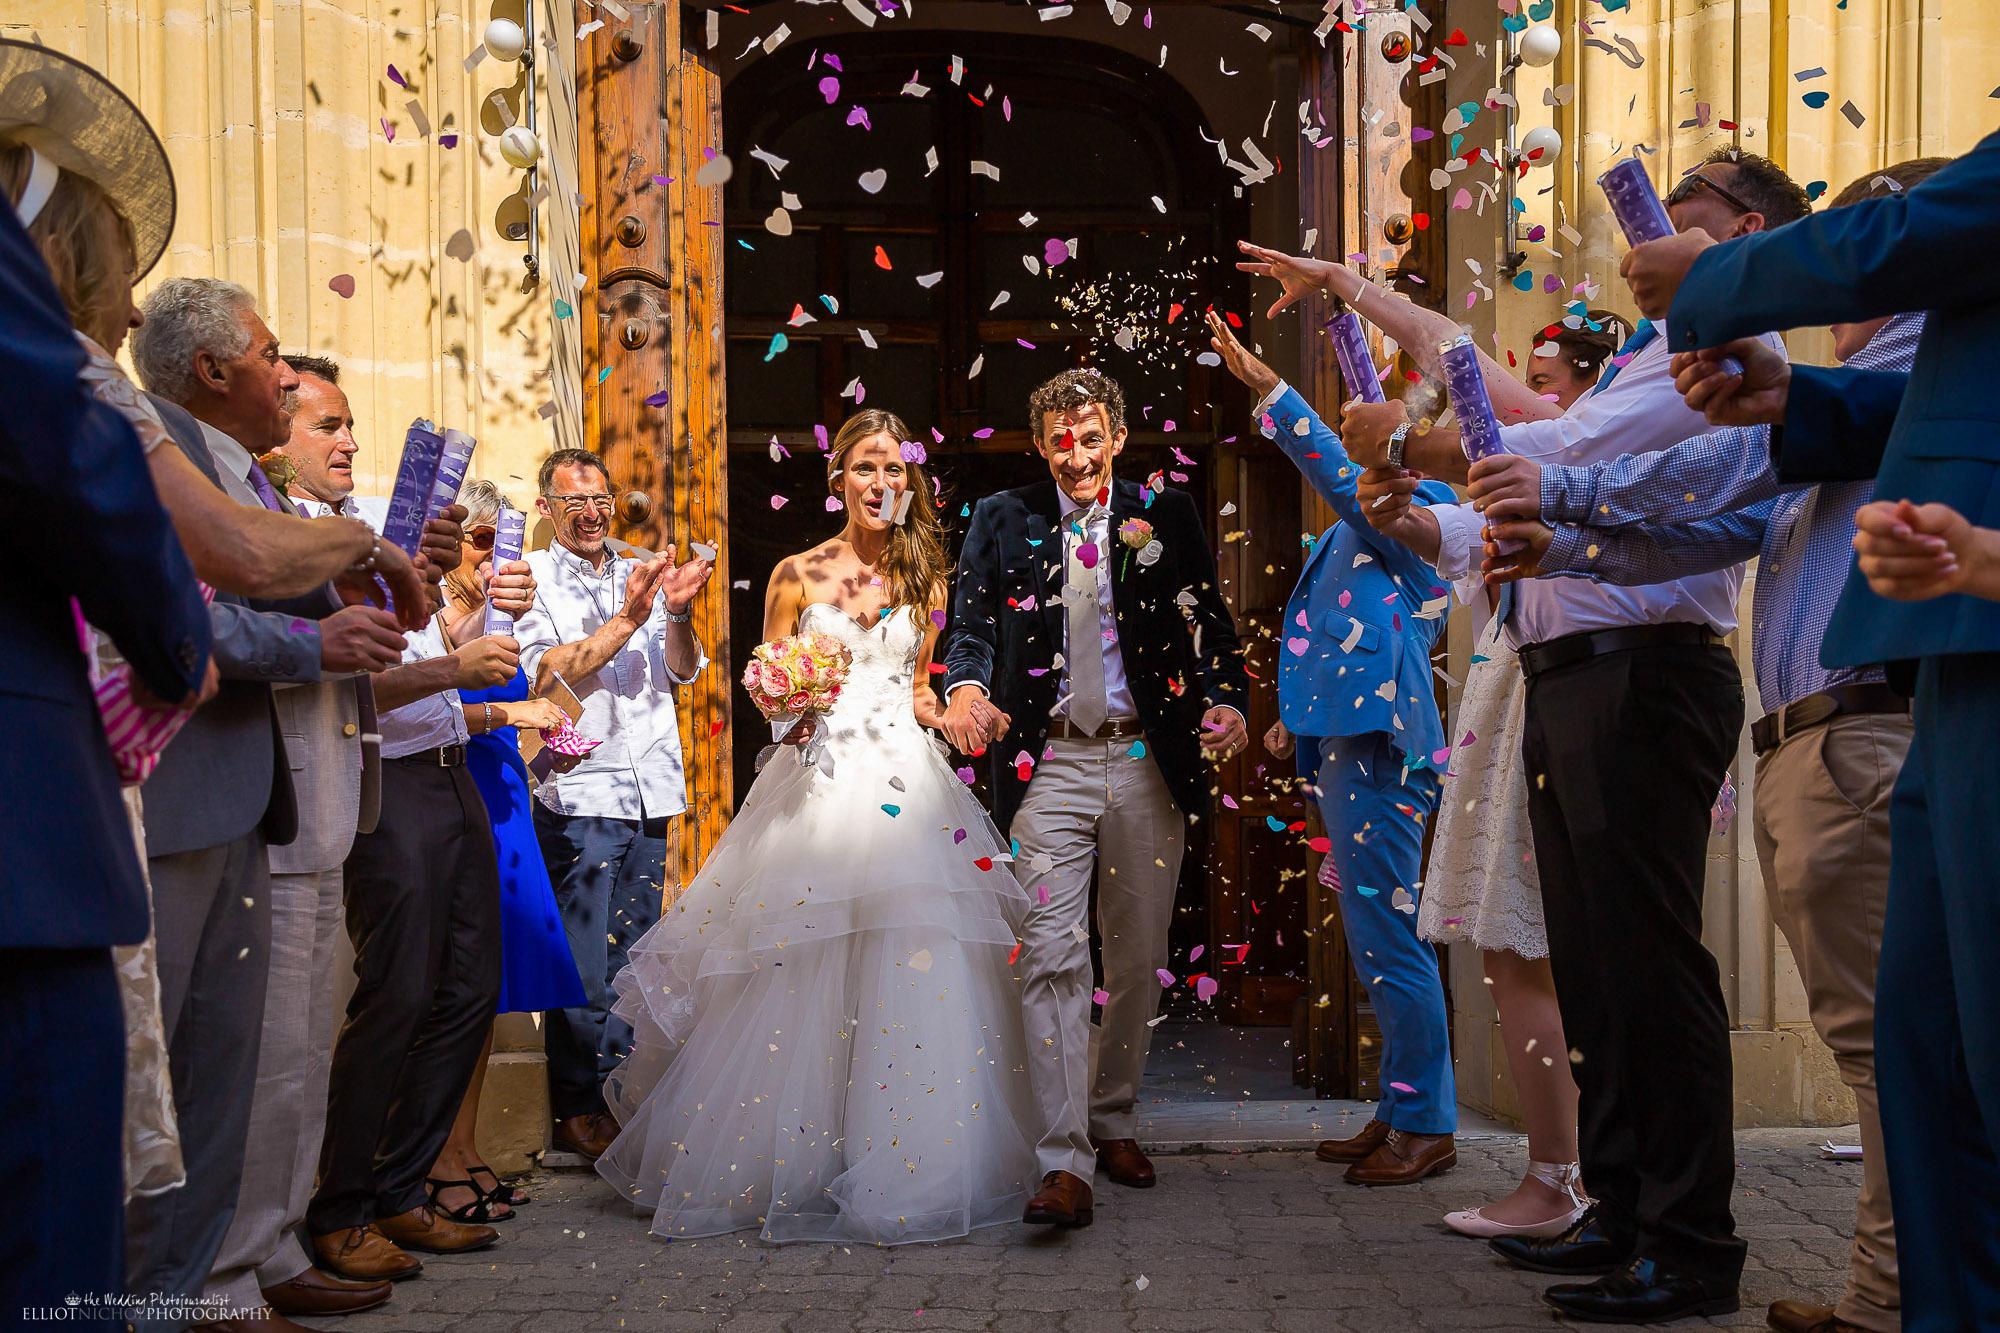 wedding-confetti-Northeast-wedding-photographer-Newcastle